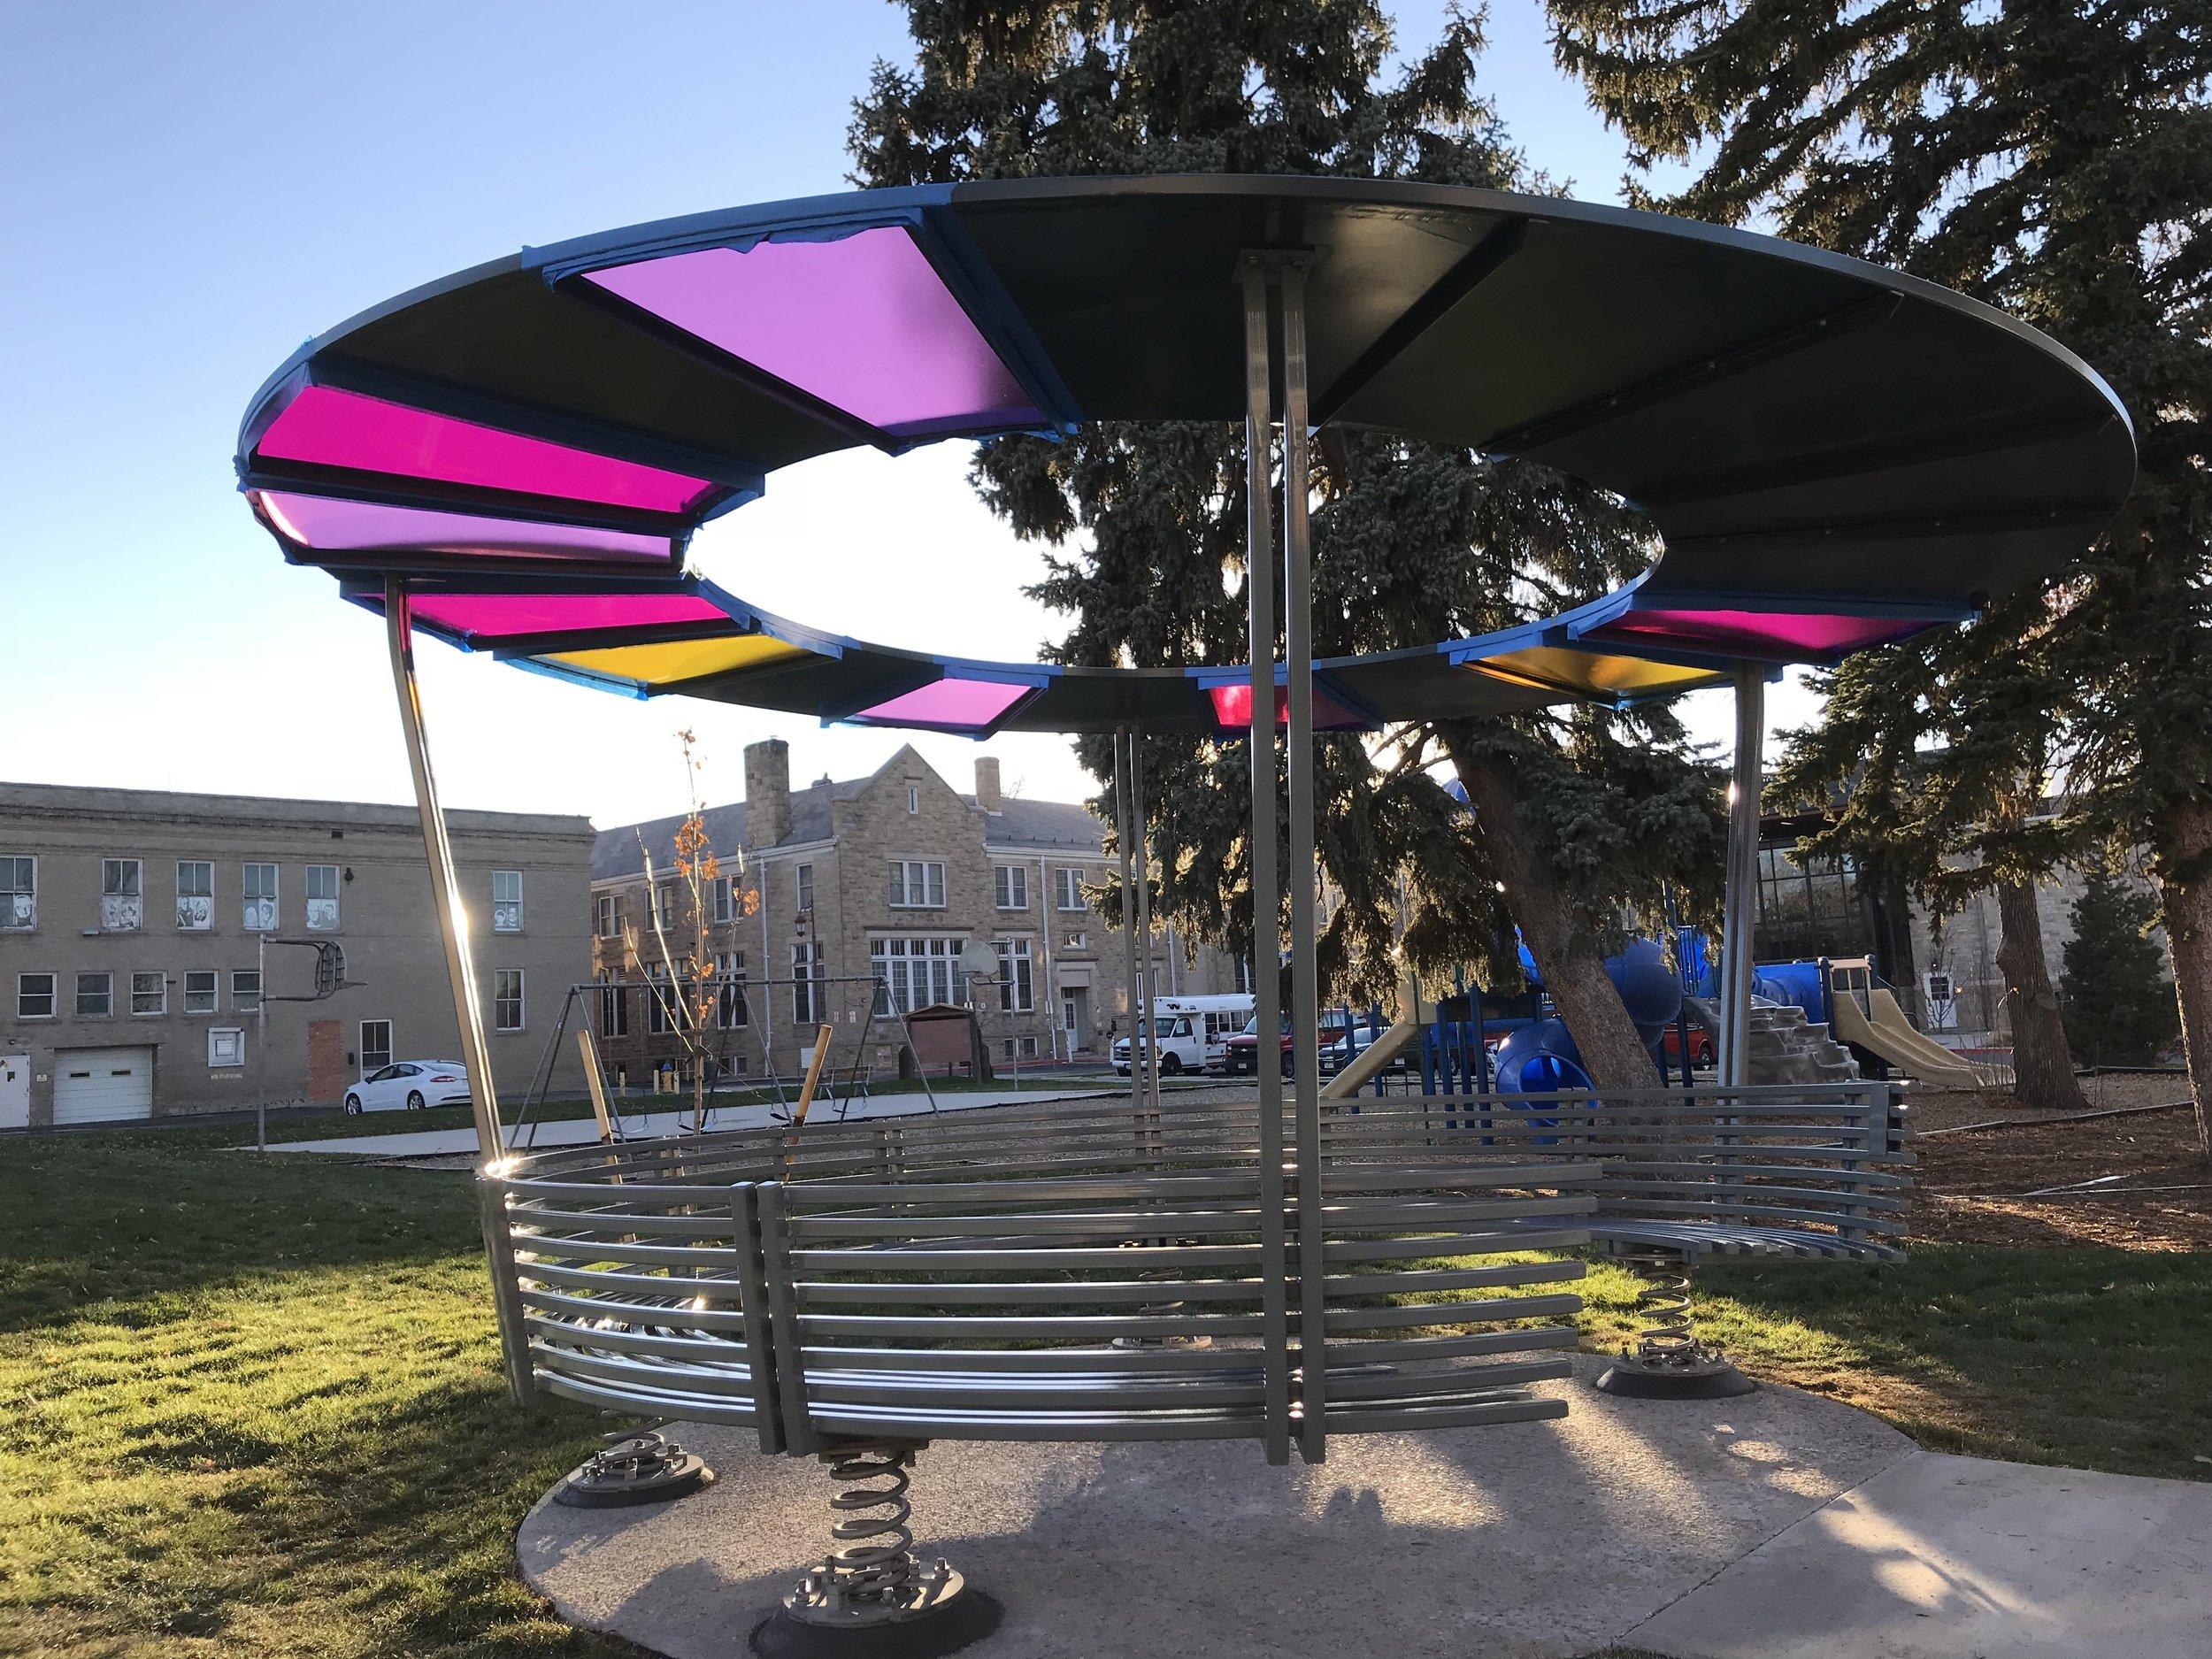 Matthew Geller_Springs_Colorado Springs_Public Art Services_J Grant Projects_20.JPEG